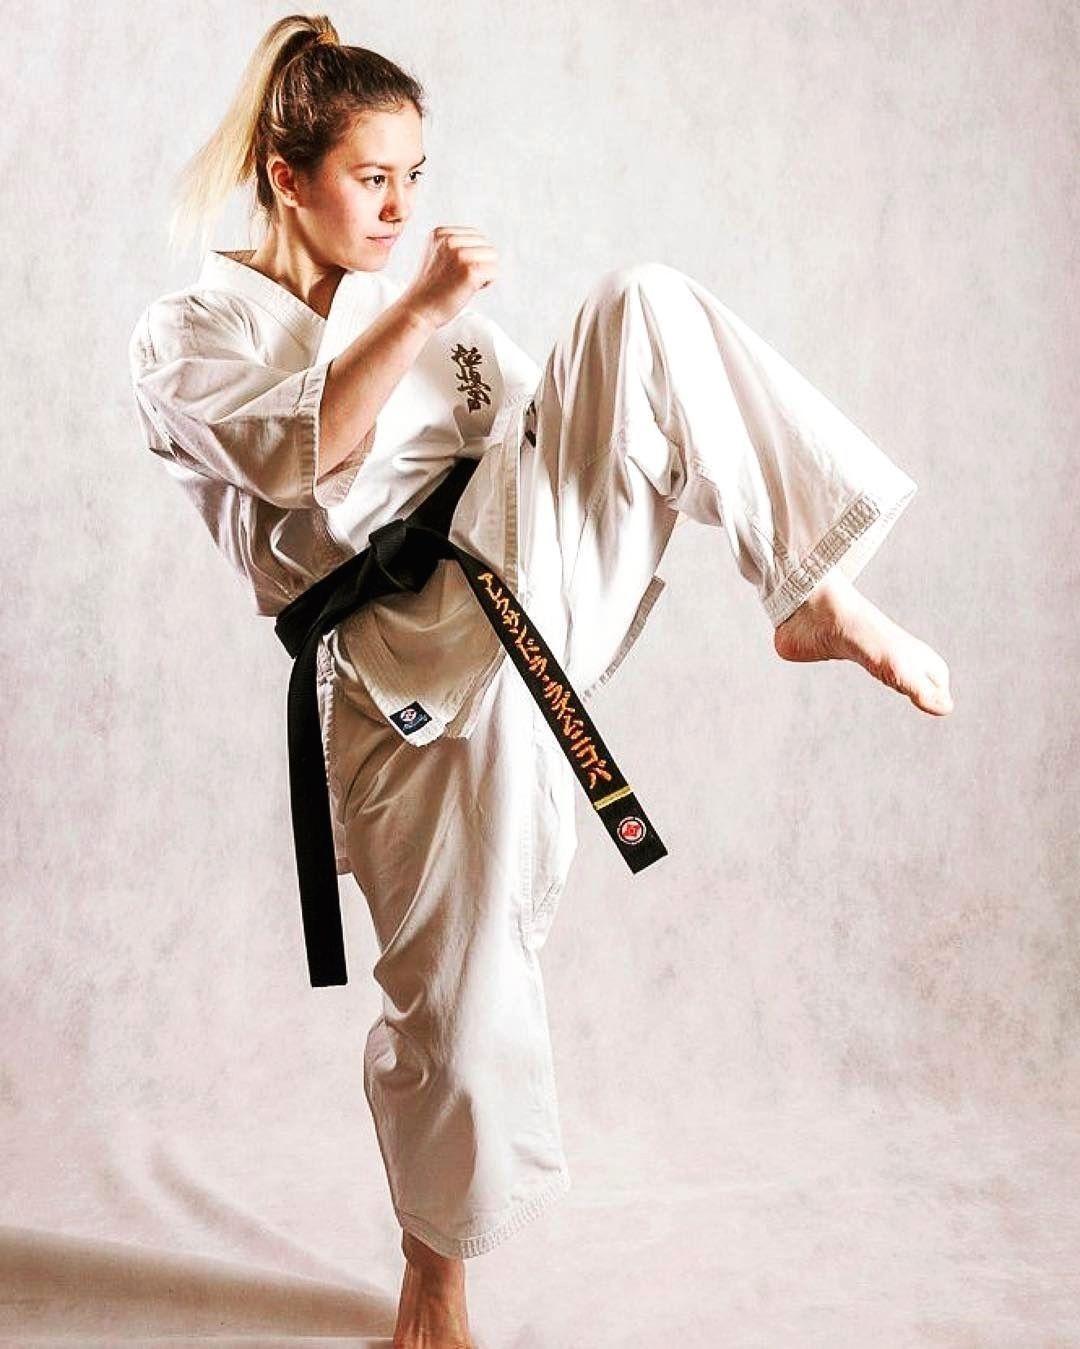 Pin on Martial Art فنون القتال